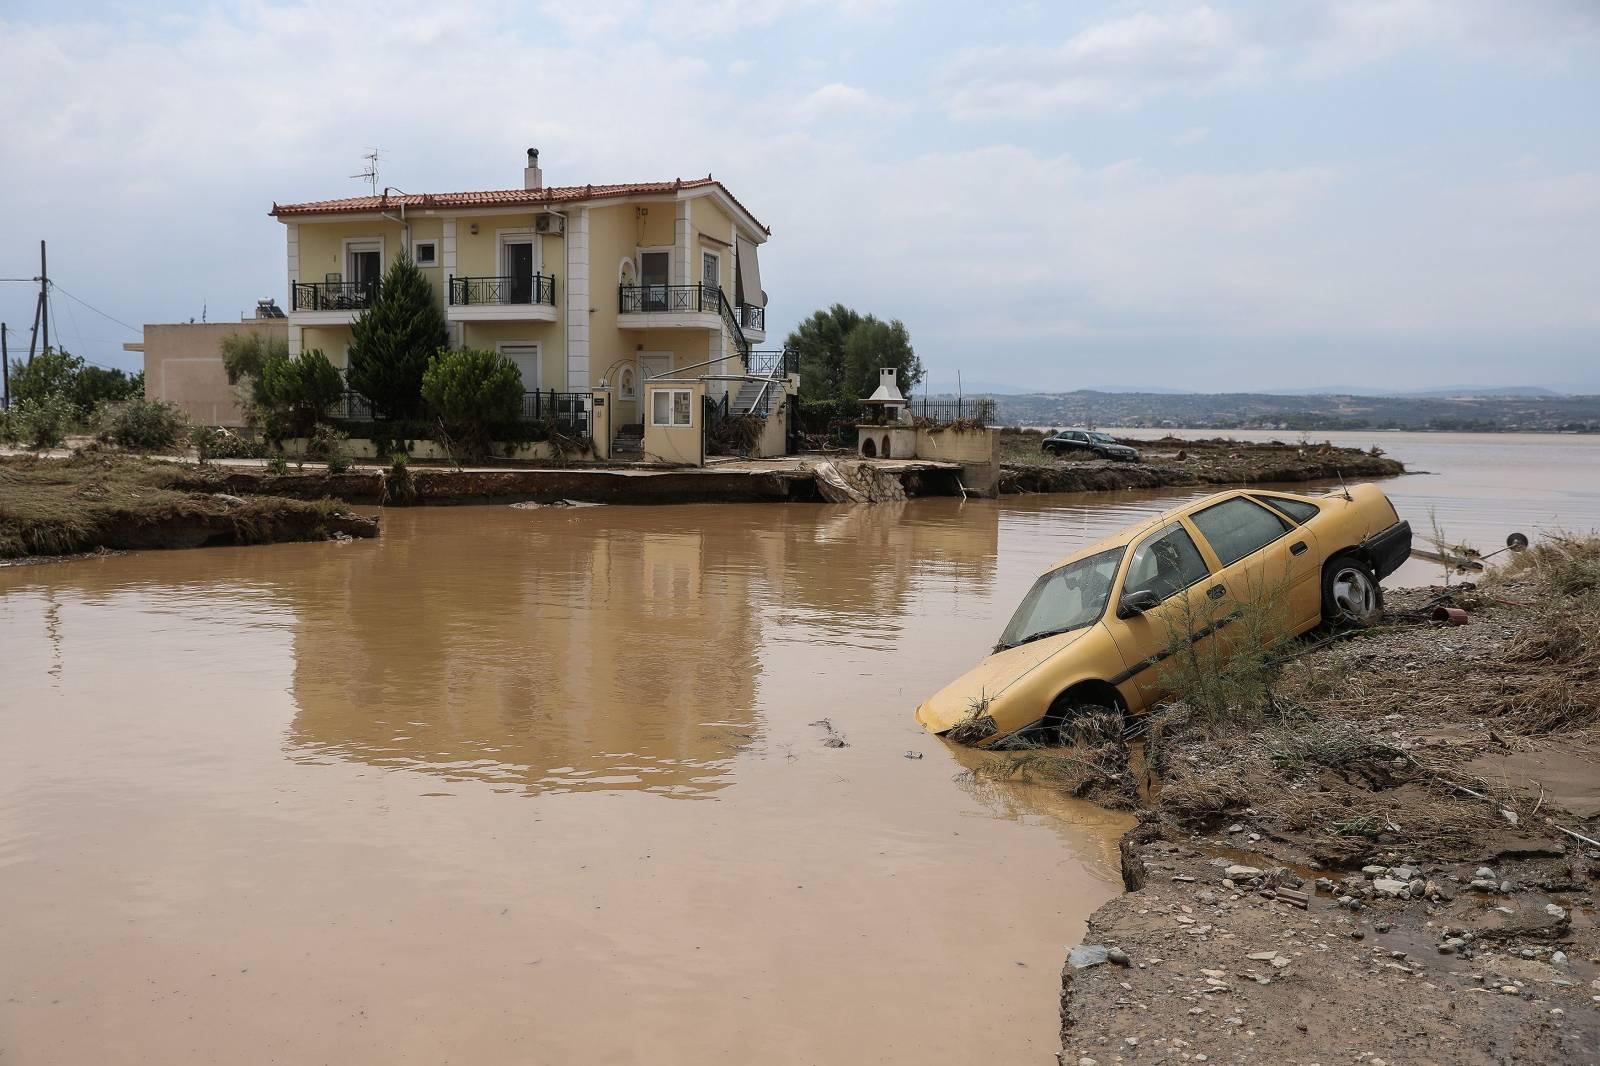 Flash floods on the island of Evia